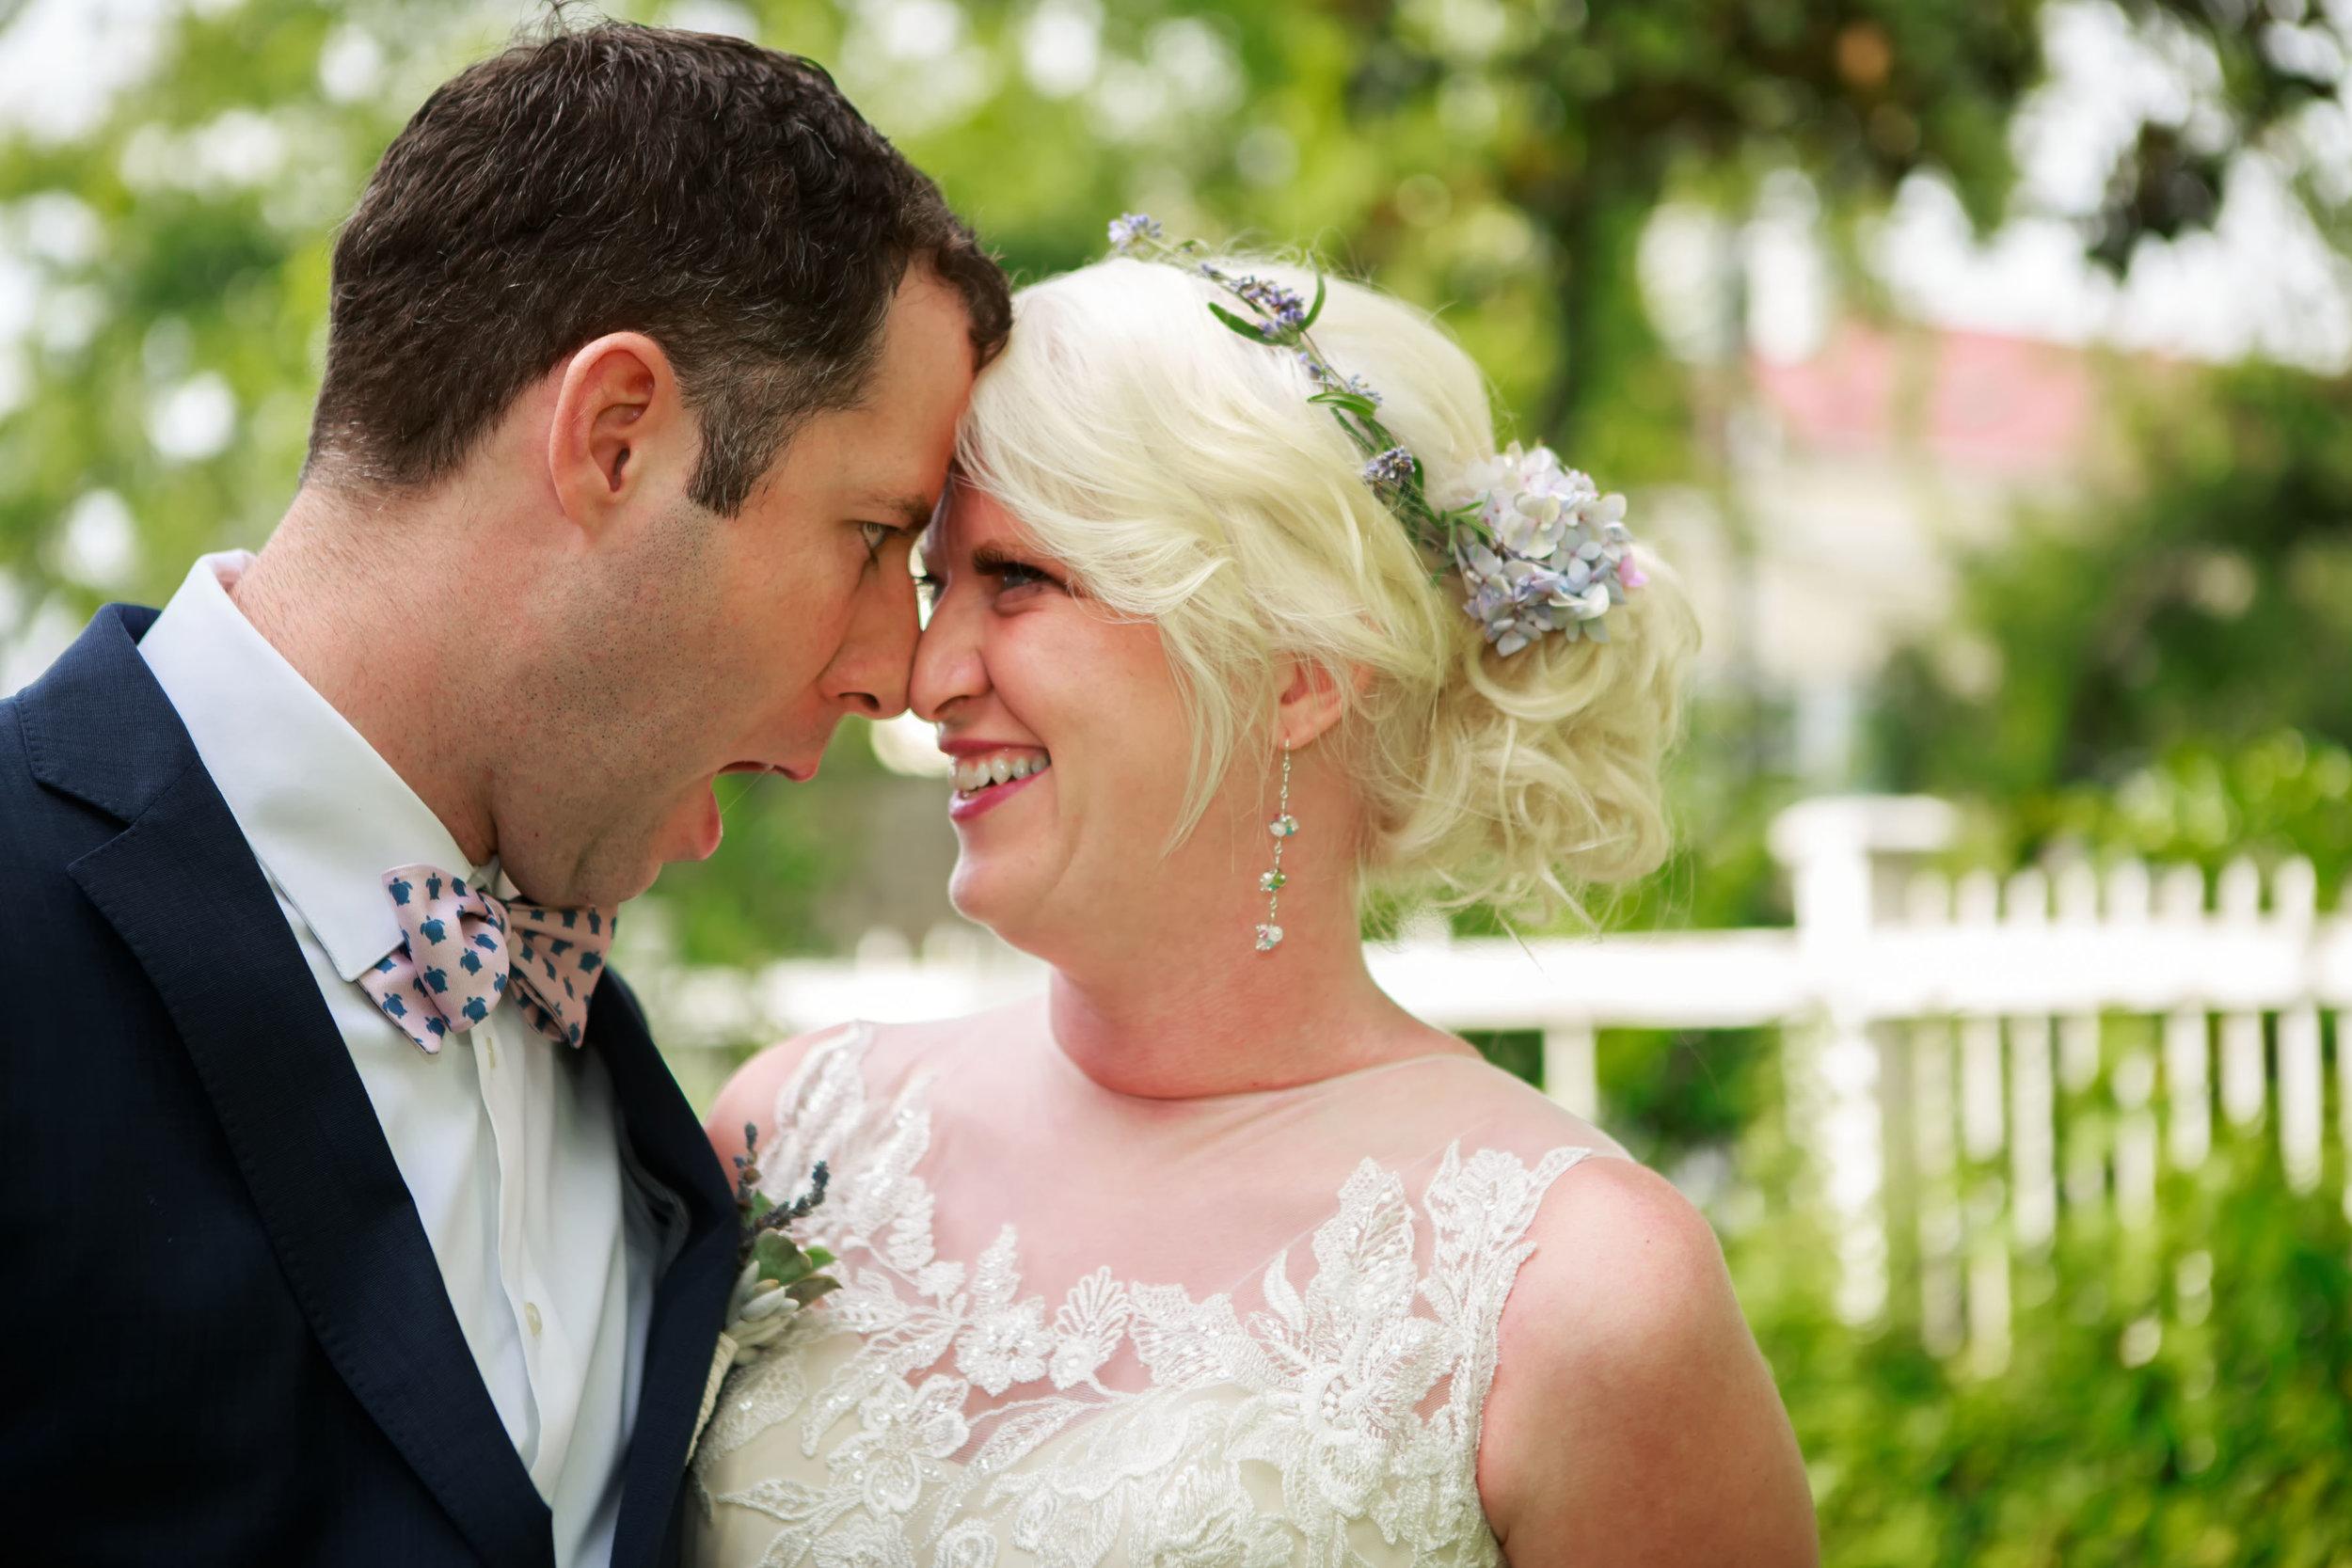 128-South-Wedding-Tiffany-Abruzzo-Photography-Bride-&-Groom-24.jpg